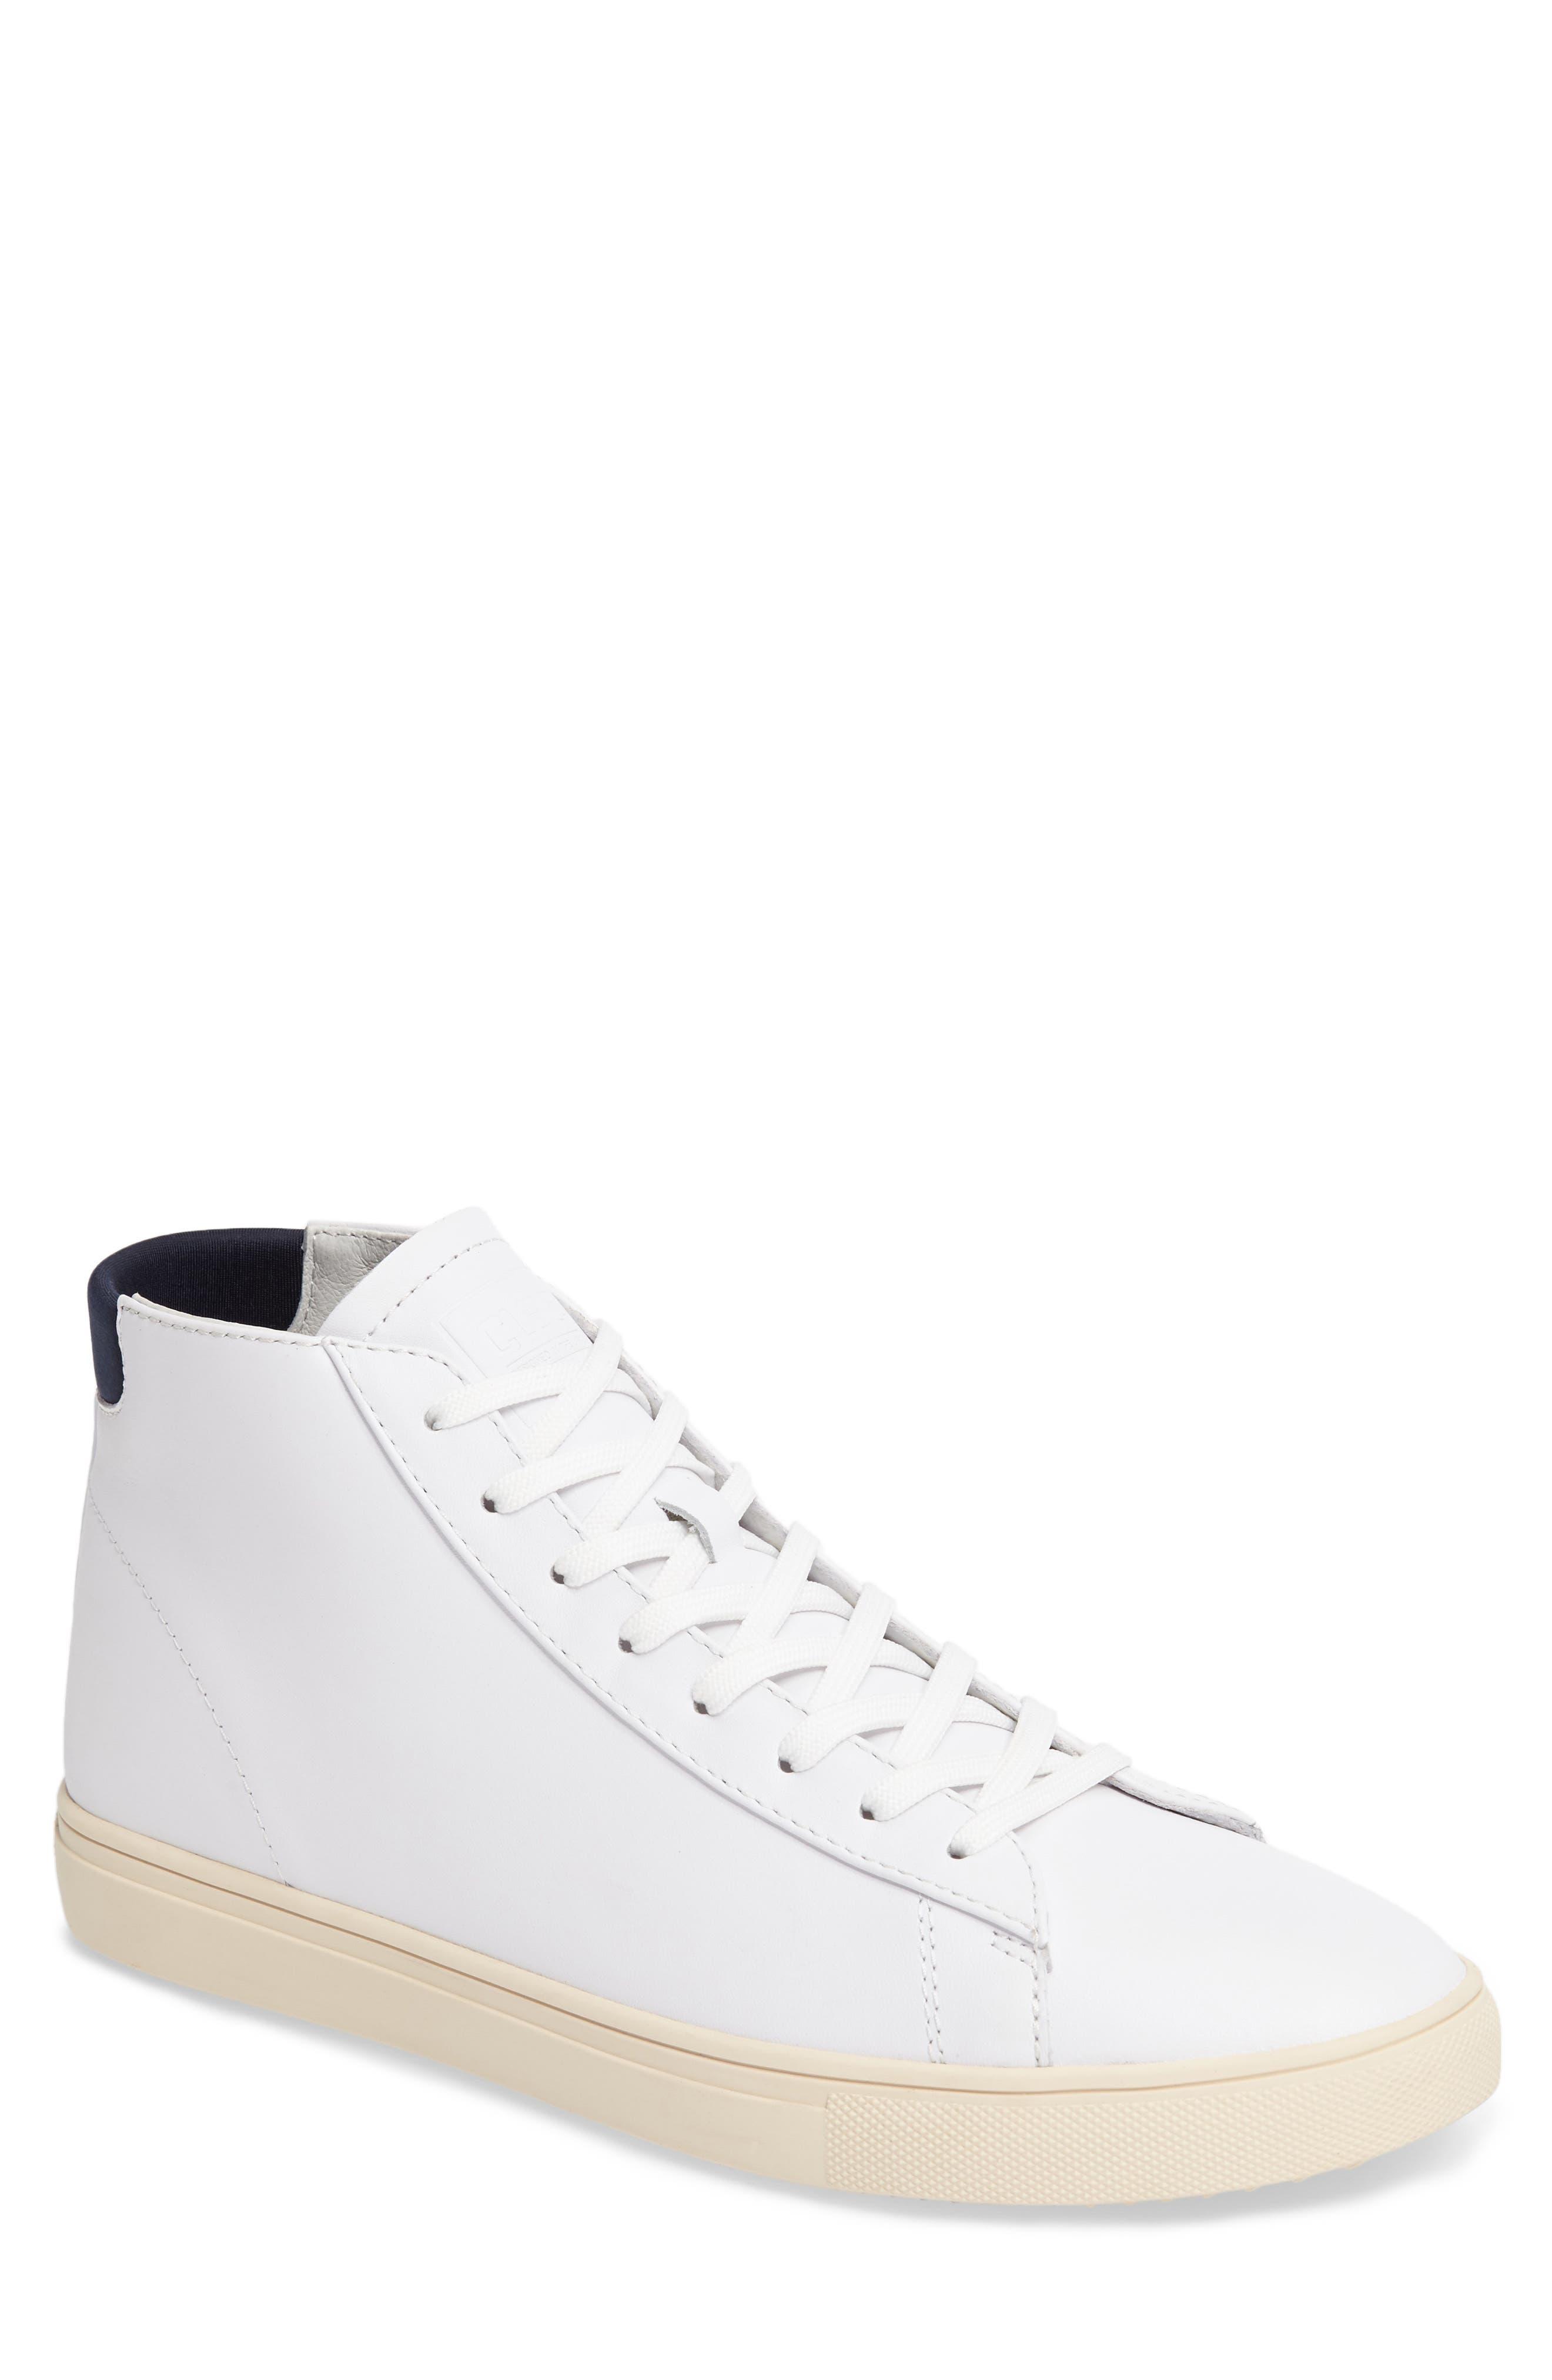 'Bradley Mid' Sneaker,                             Main thumbnail 1, color,                             WHITE/WHITE LEATHER